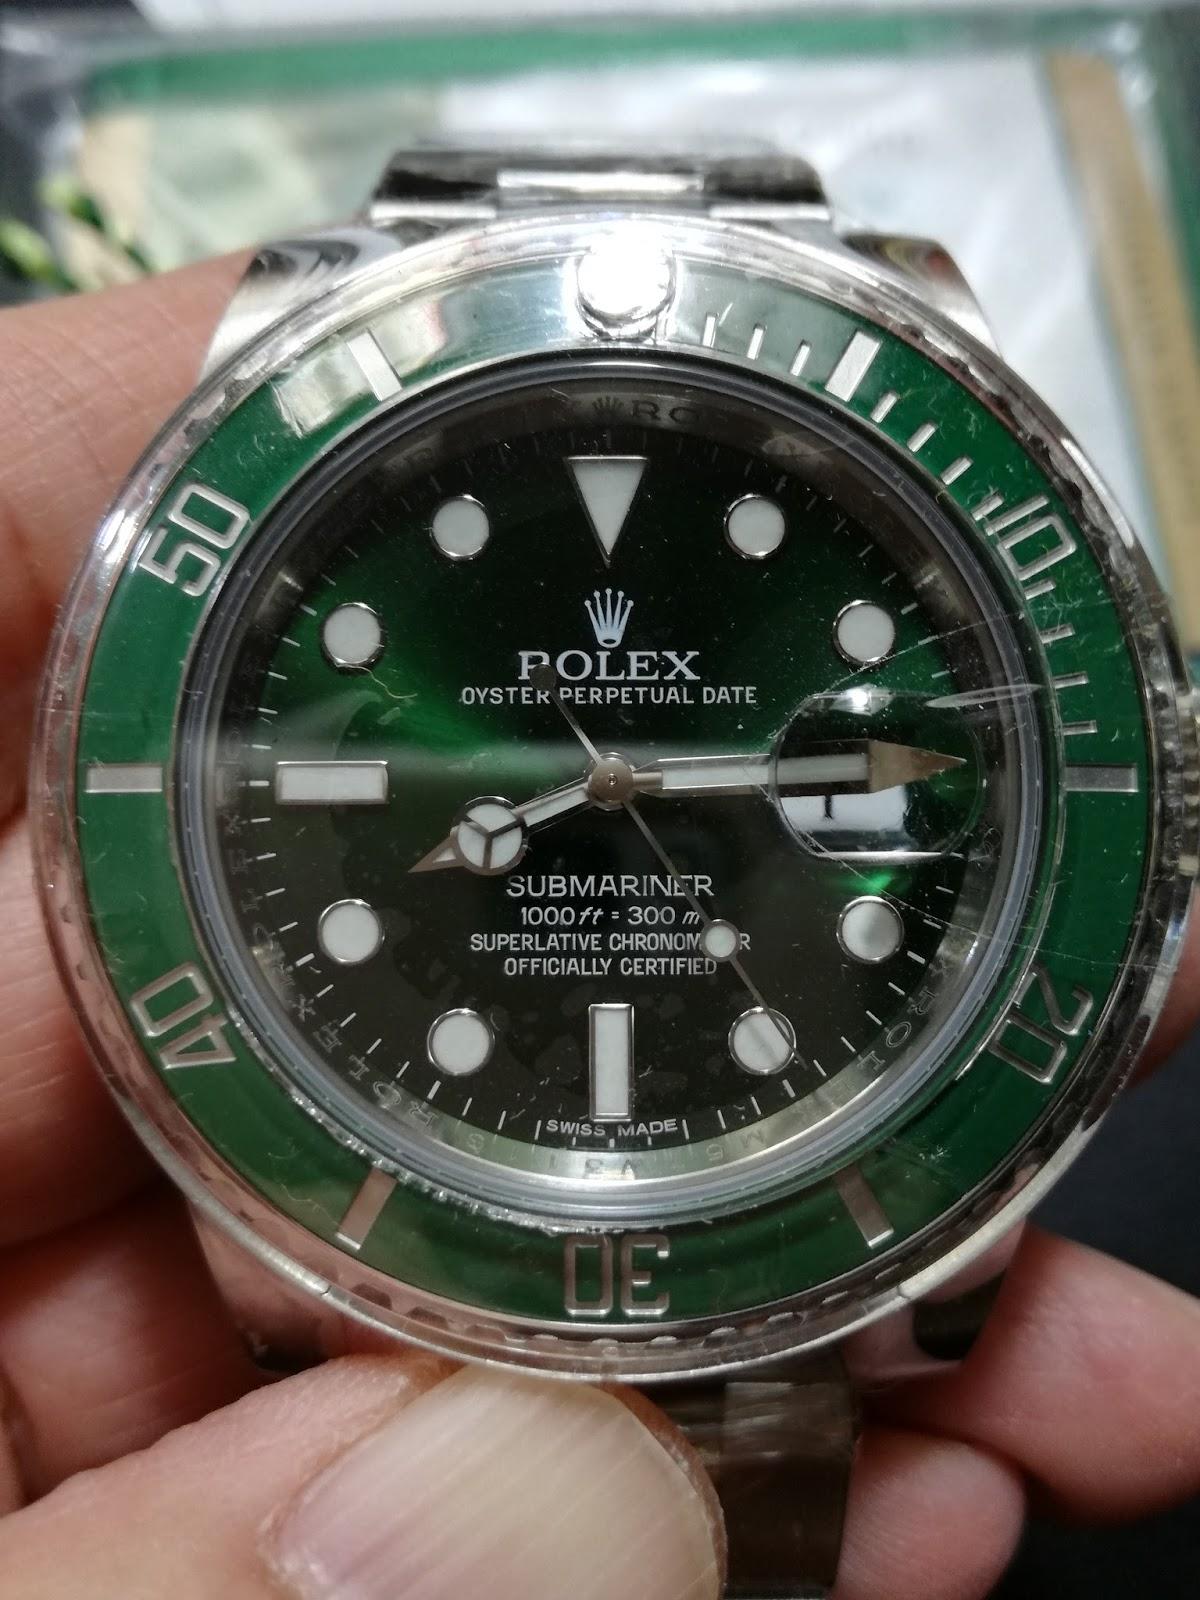 Hong Kong Watch Fever 香港勞友 Rolex Submariner Ref 116610lv Hulk